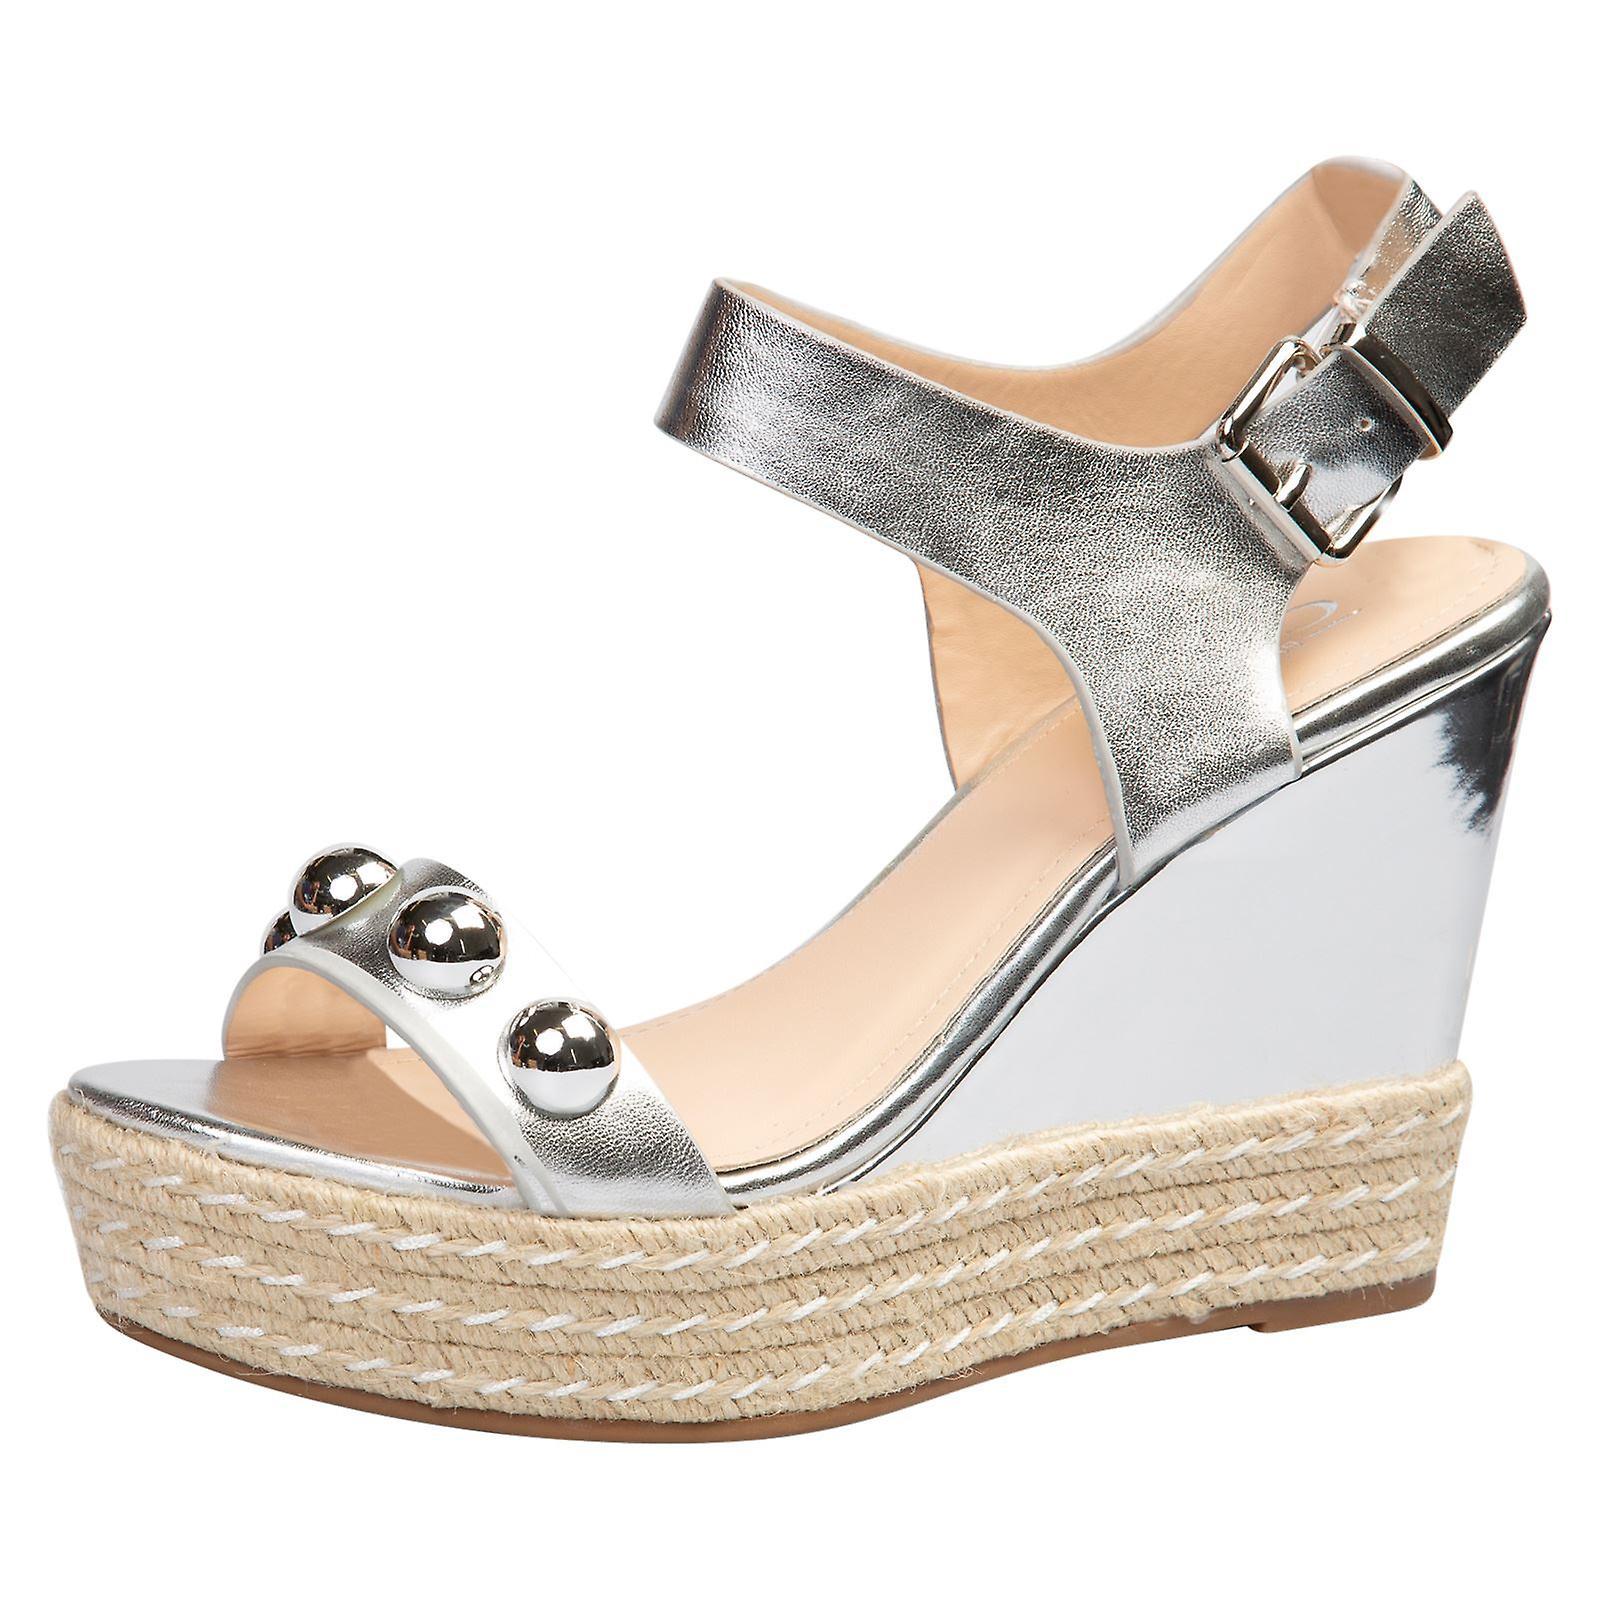 Iolanthe Womens High Wedge Heels Platforms Studded Sandals